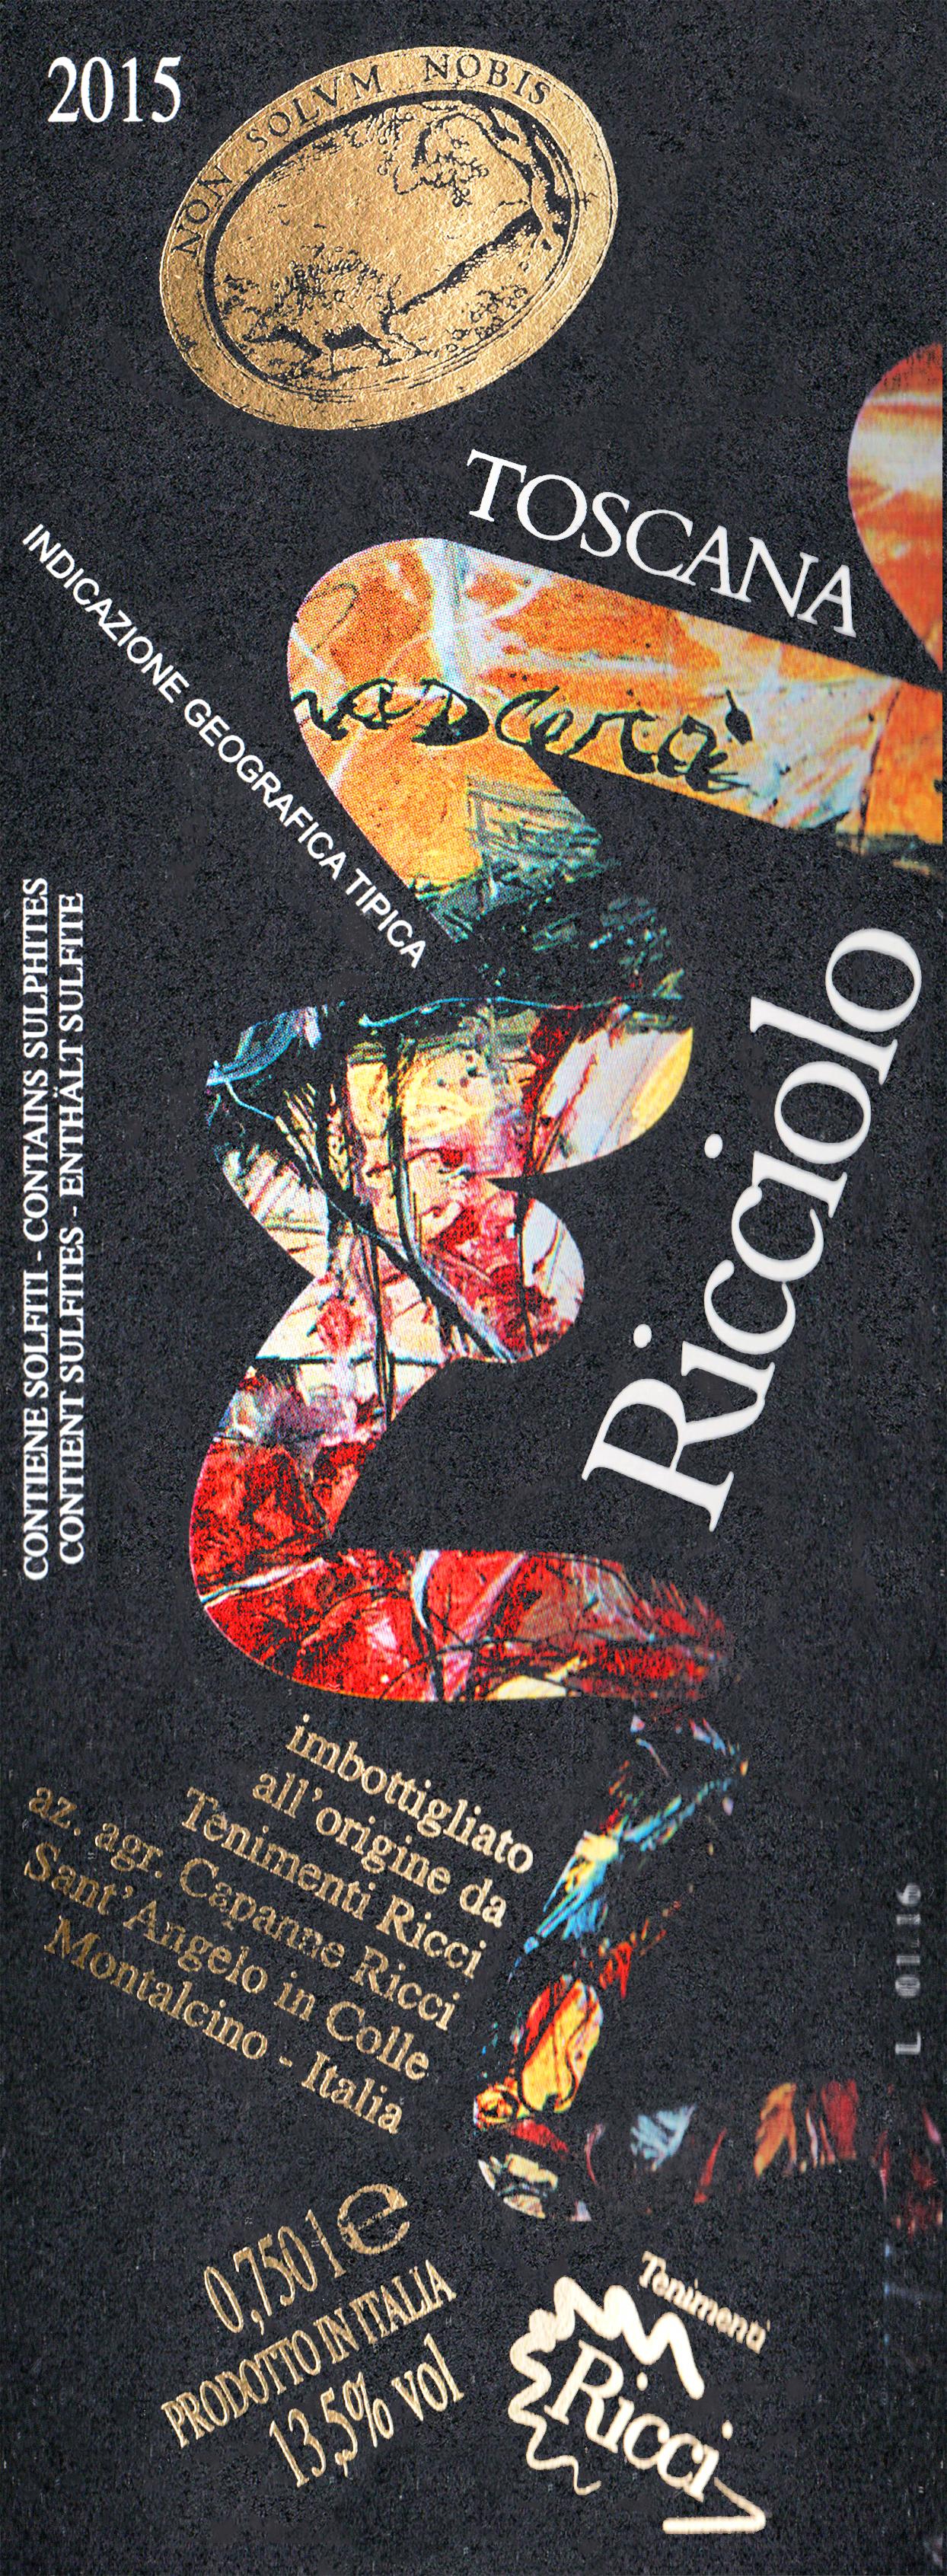 Capanne Ricci Ricciolo Igt 2015